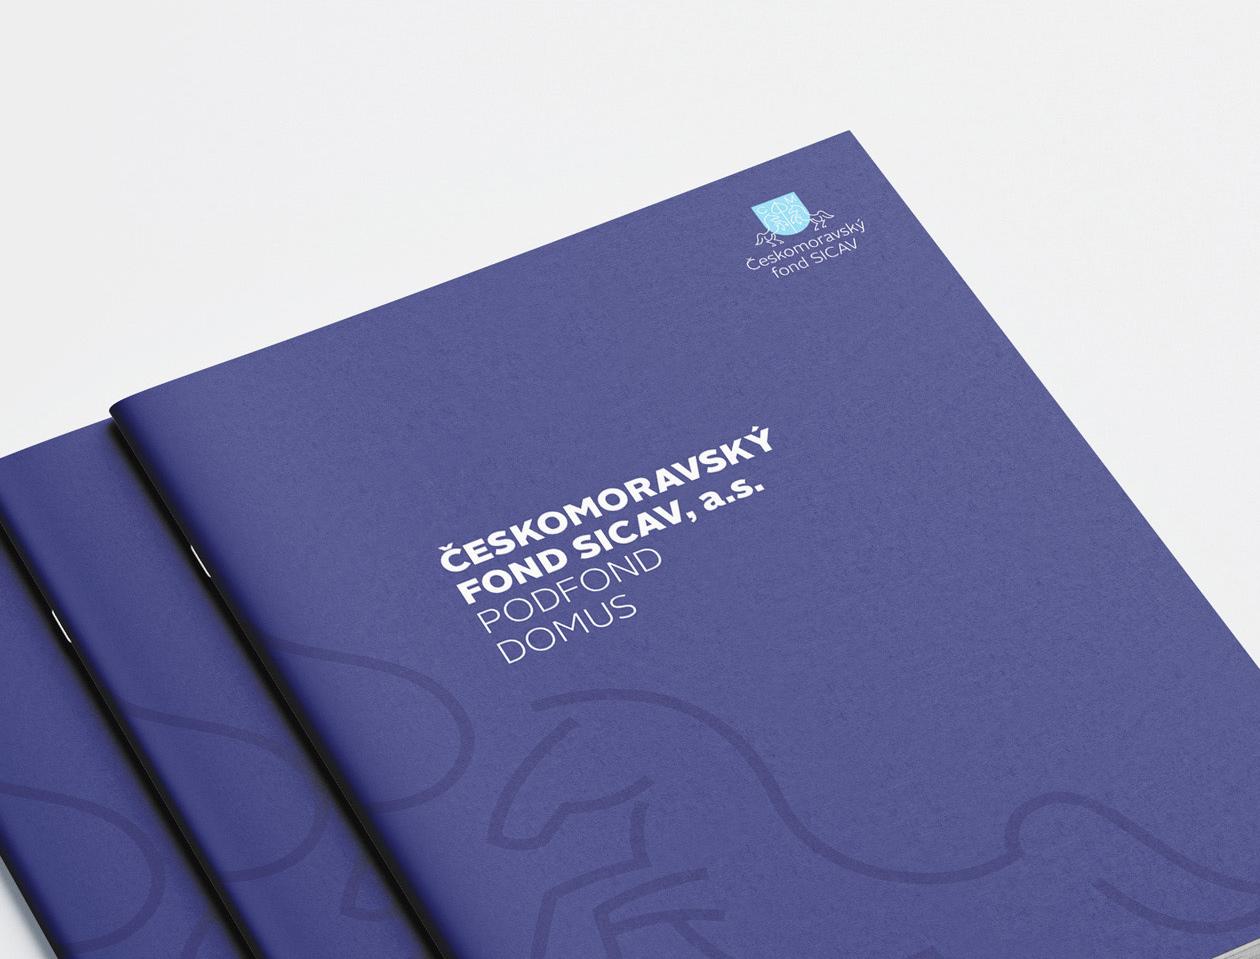 ceskomoravsky fond sicav 06